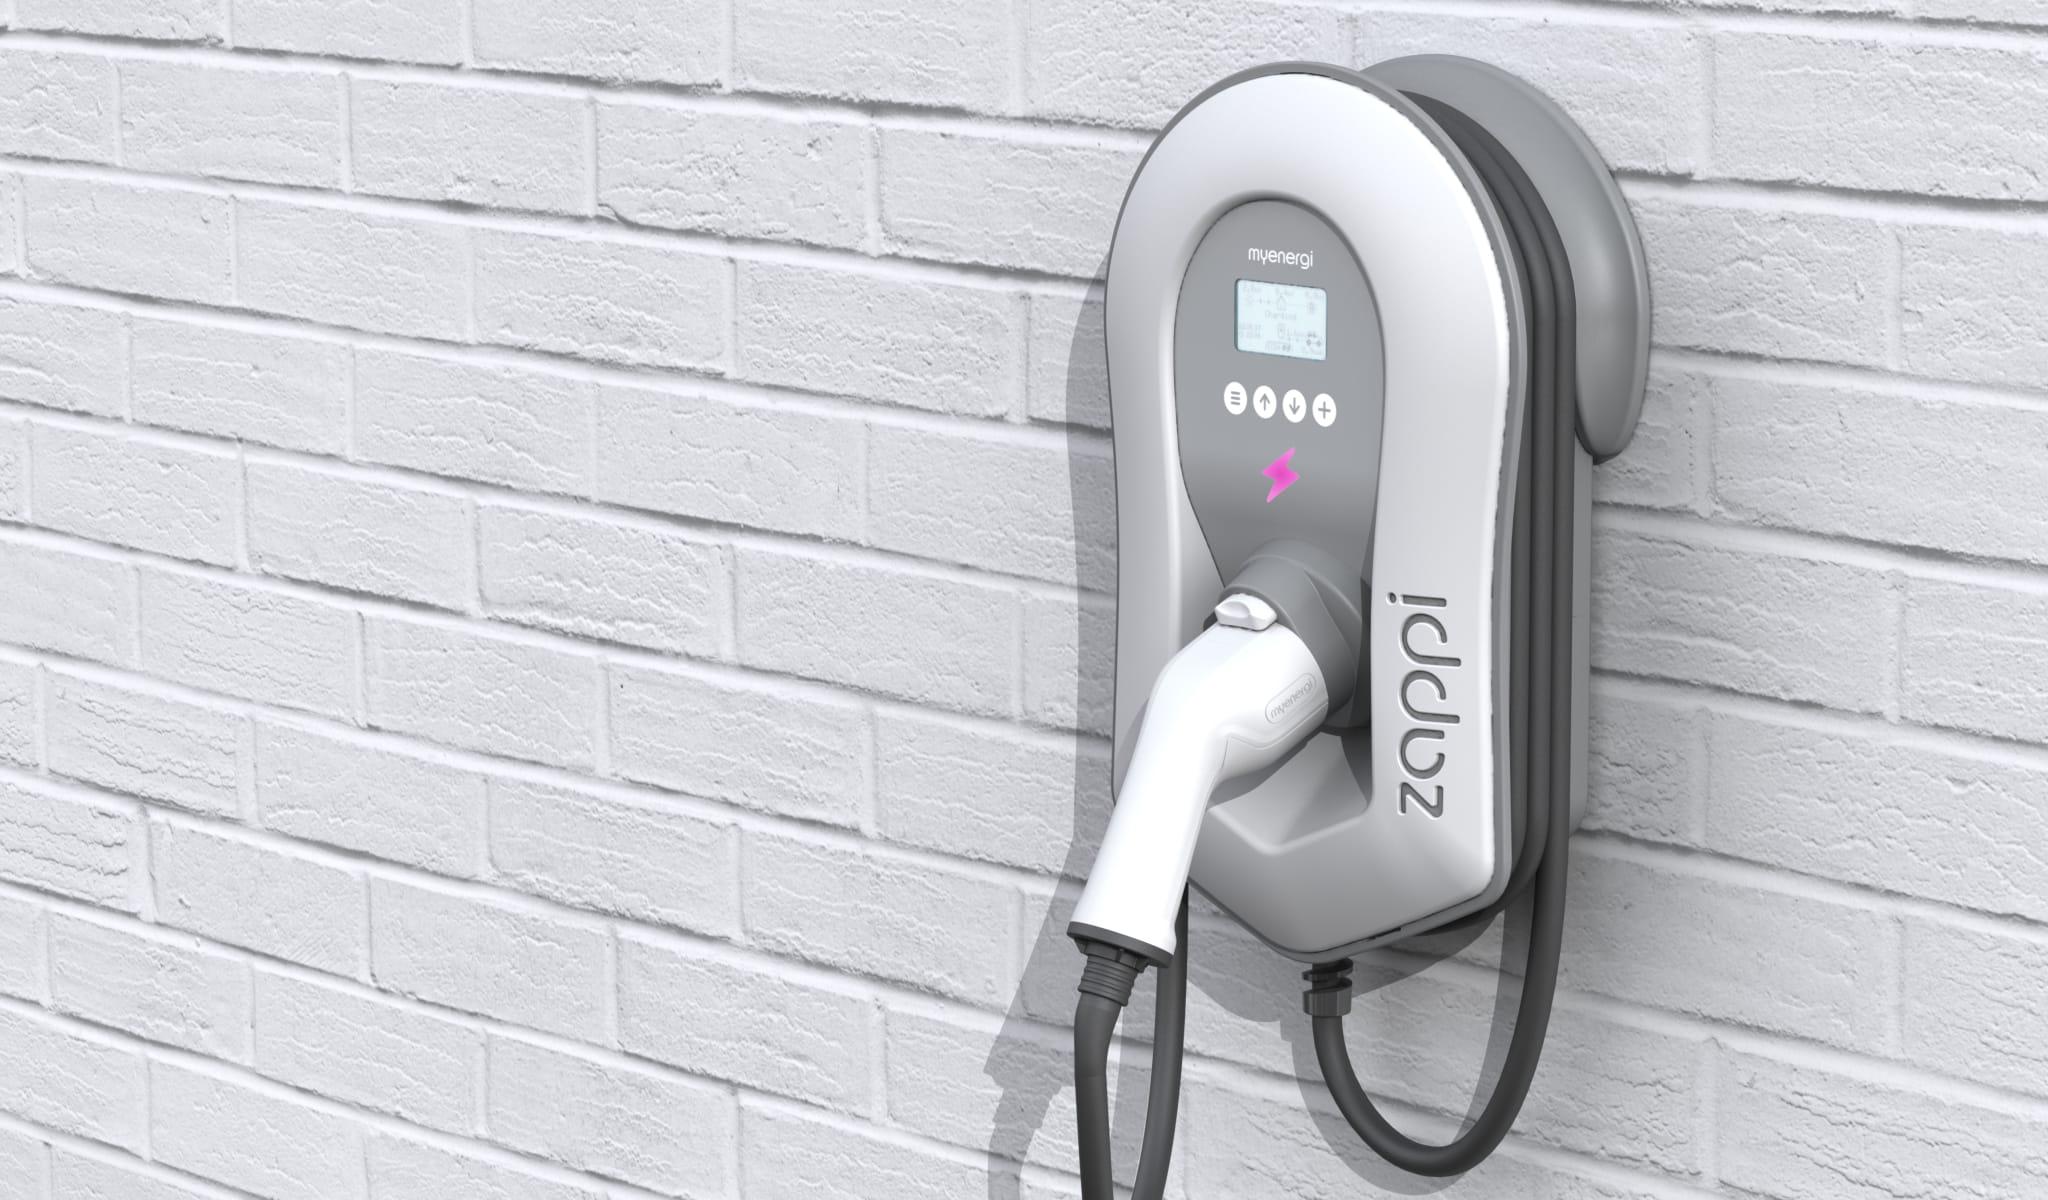 Green House Solutions zonnepanelen batterijopslag laadpalen airconditioning zappi v2 background